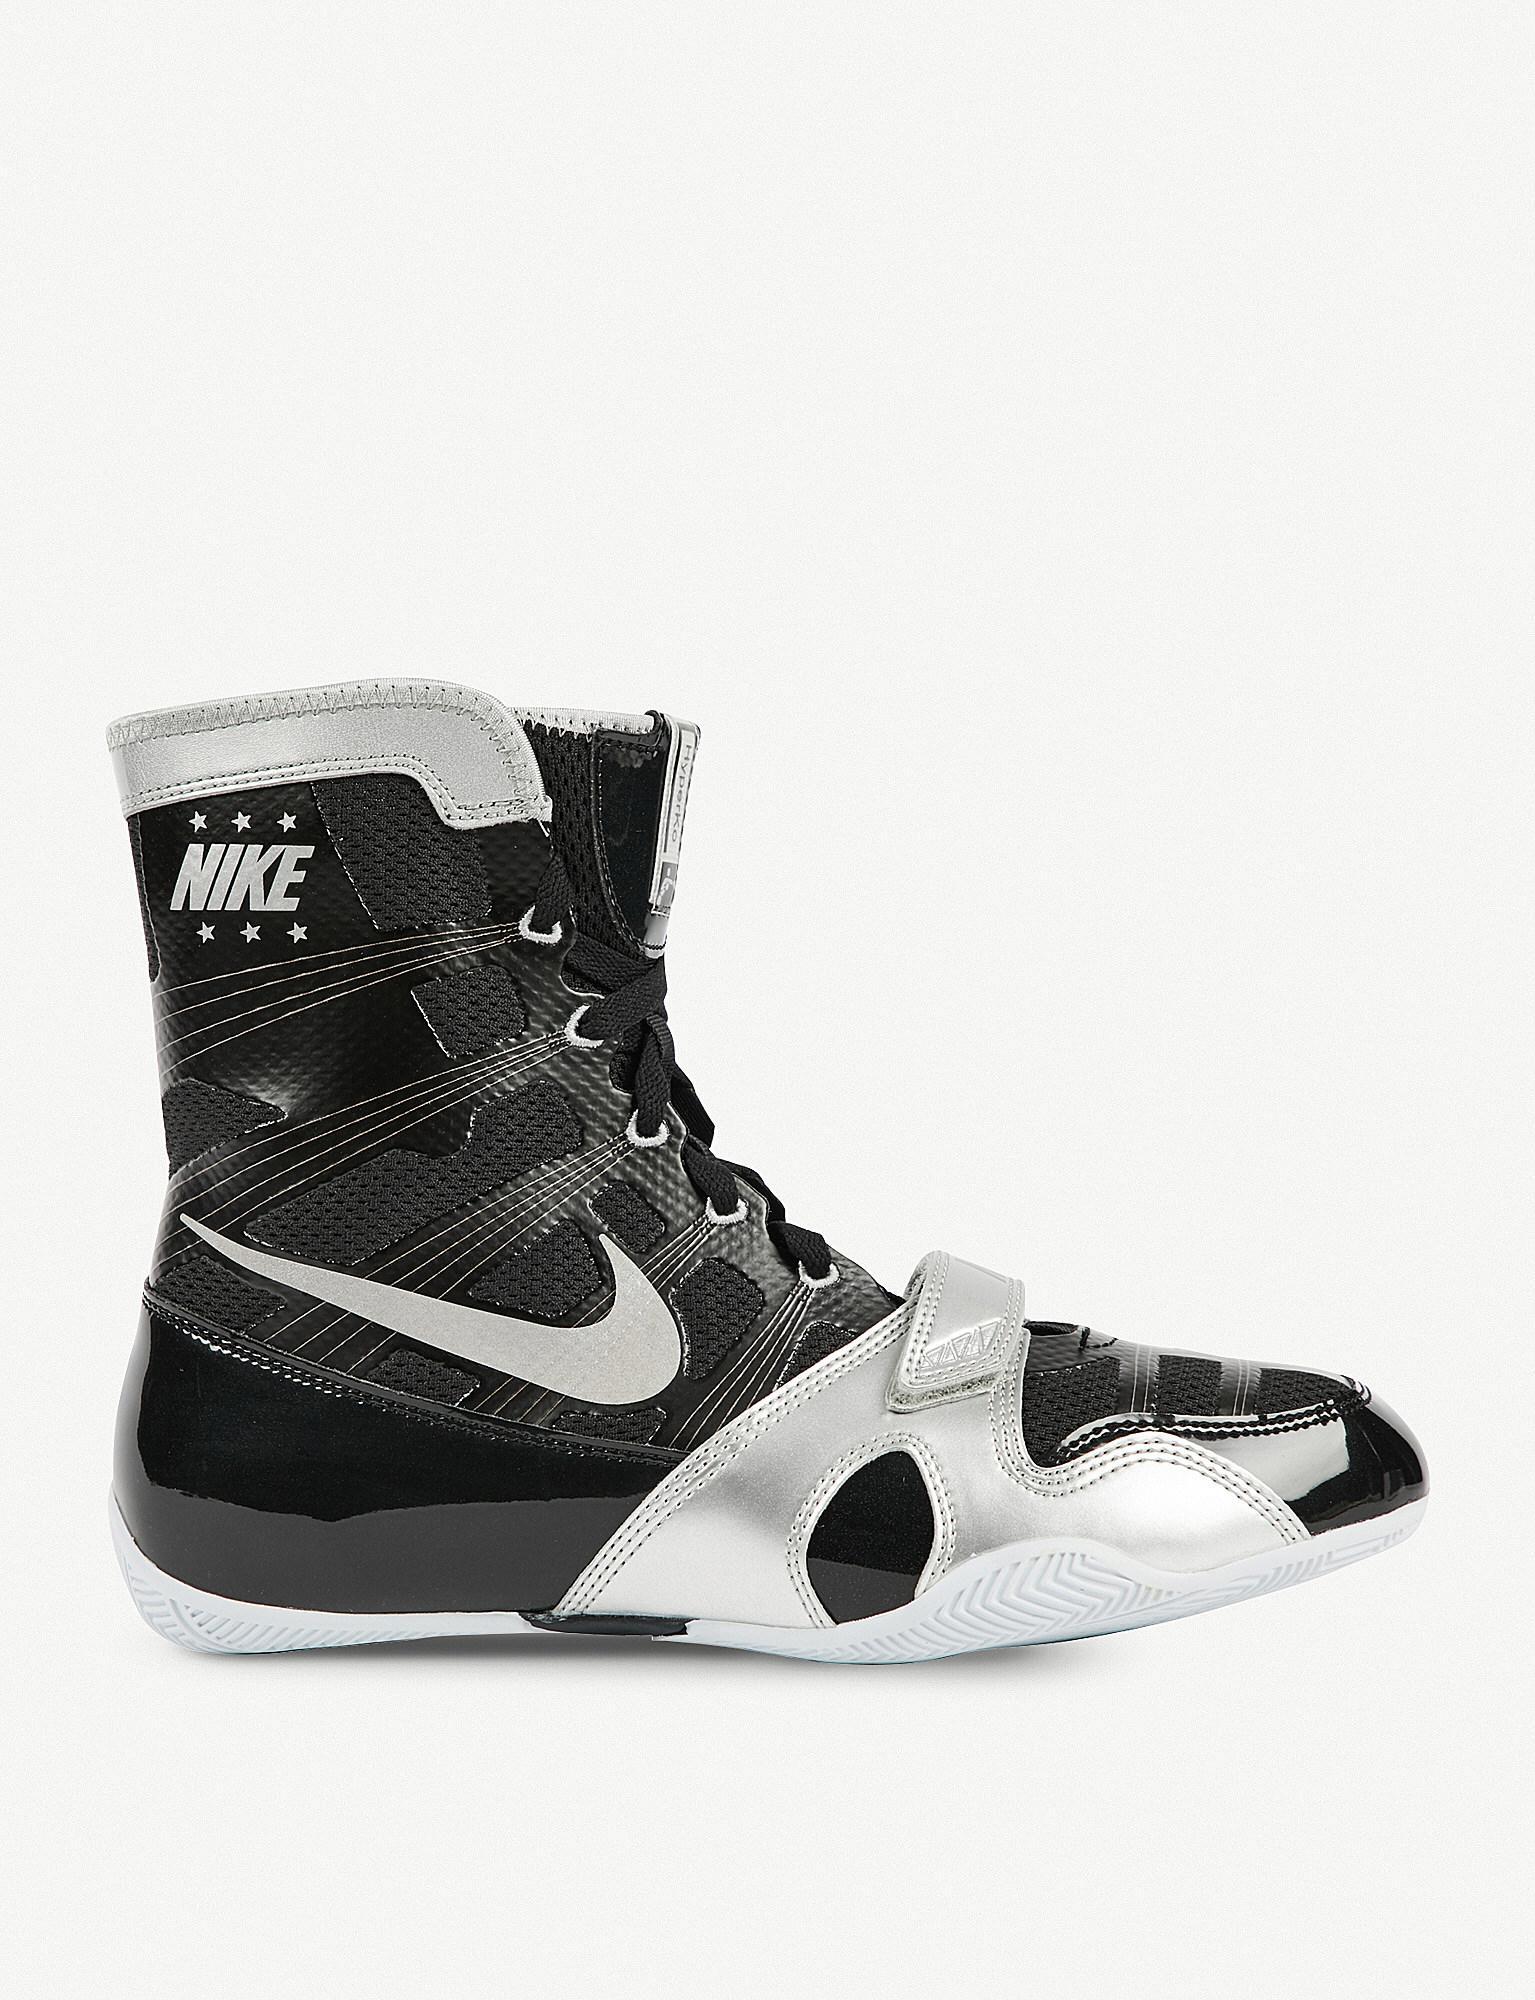 sports shoes 32284 77eca Nike Lamyland Hyper Ko Mesh Boxing Boots in Black for Men - Lyst